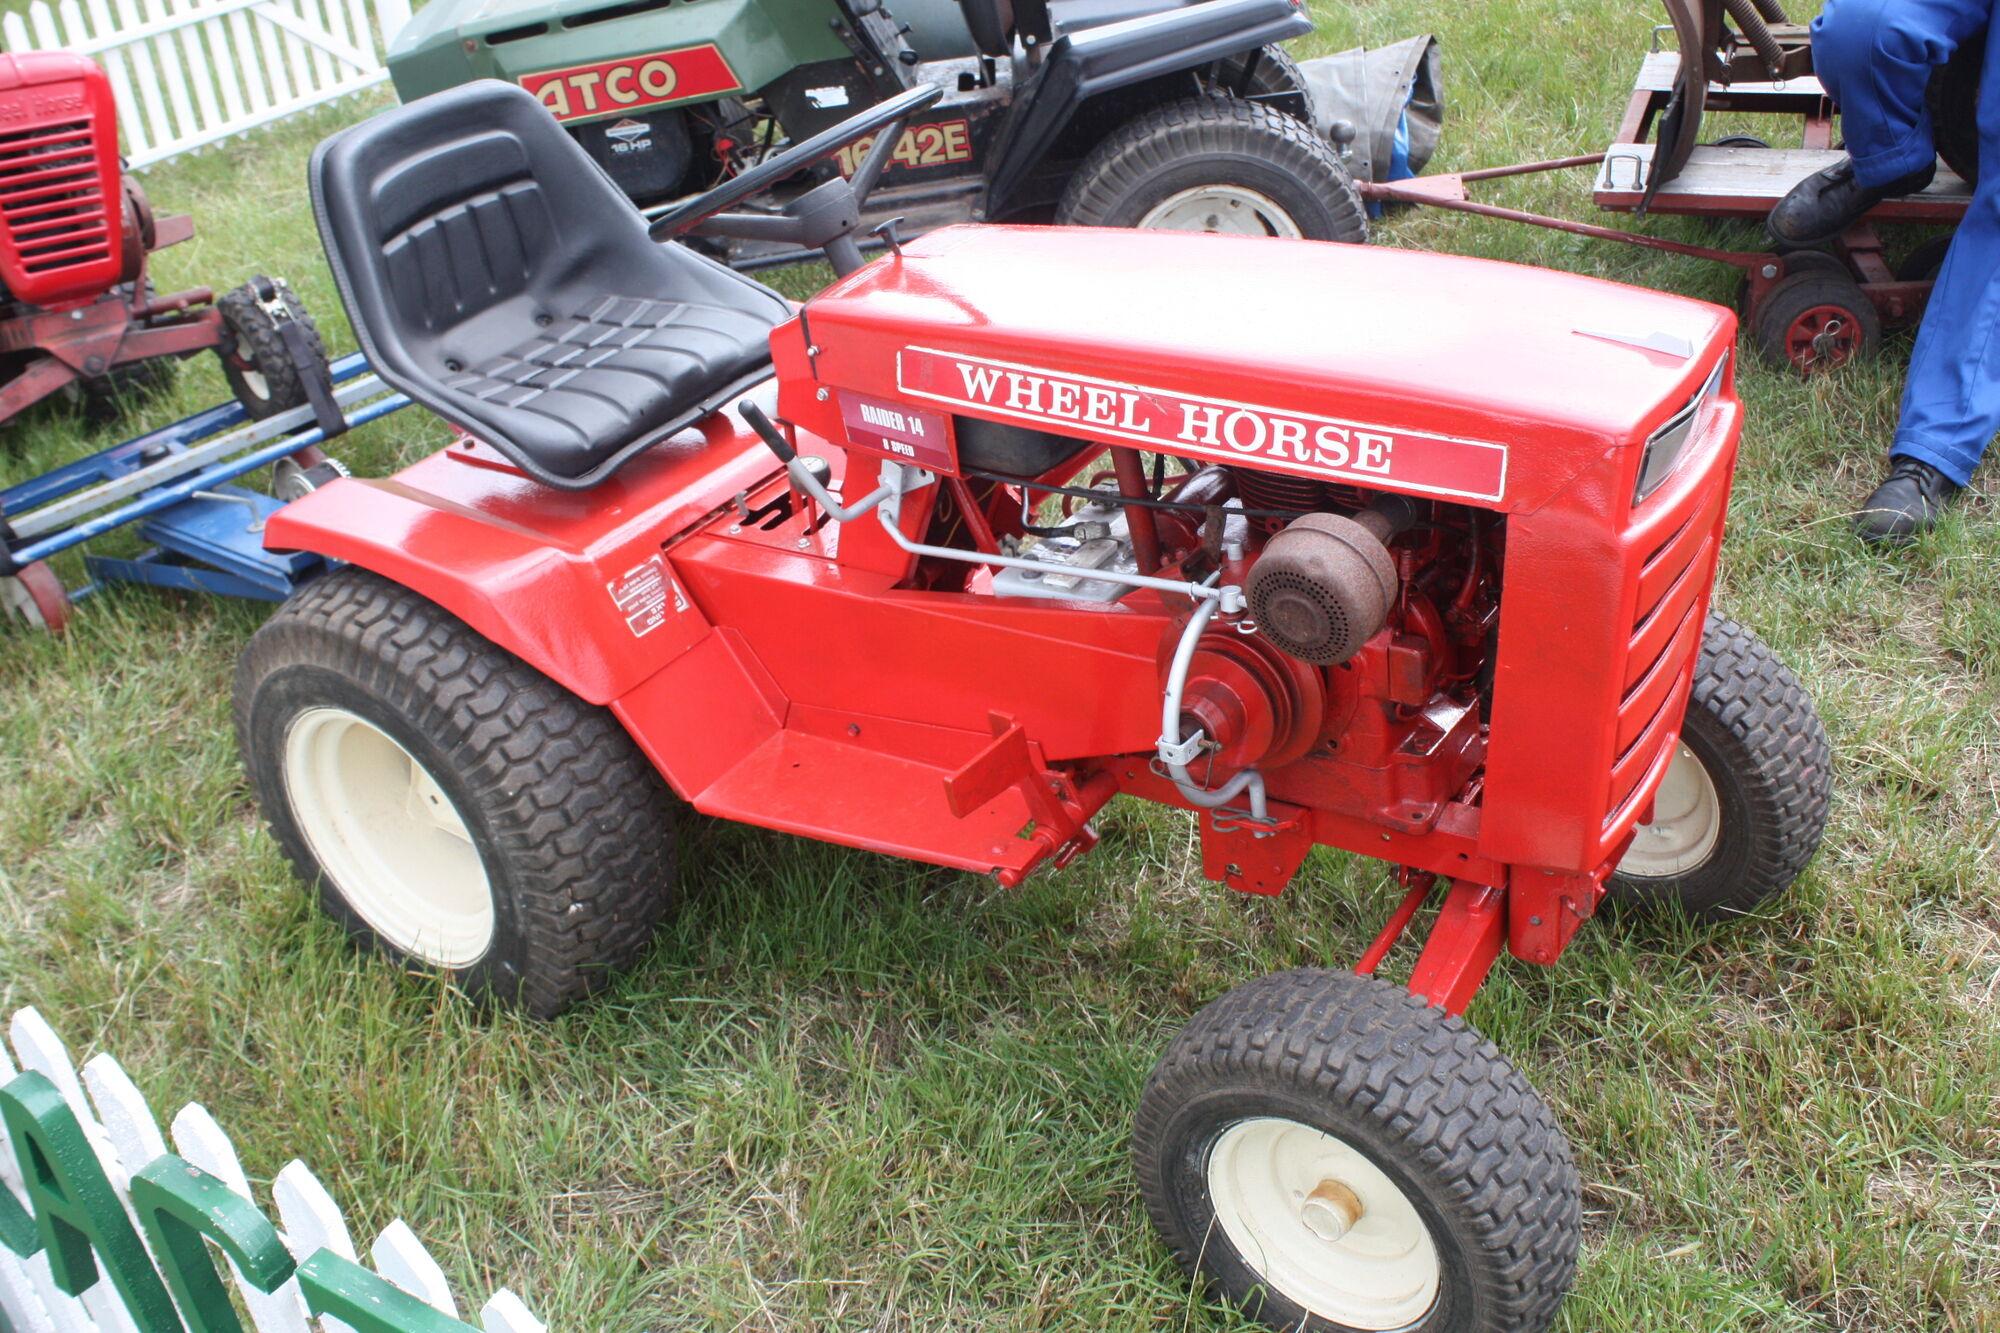 Wiring Diagram Wheel Horse Lawn Tractor : Wheel horse raider tractor construction plant wiki